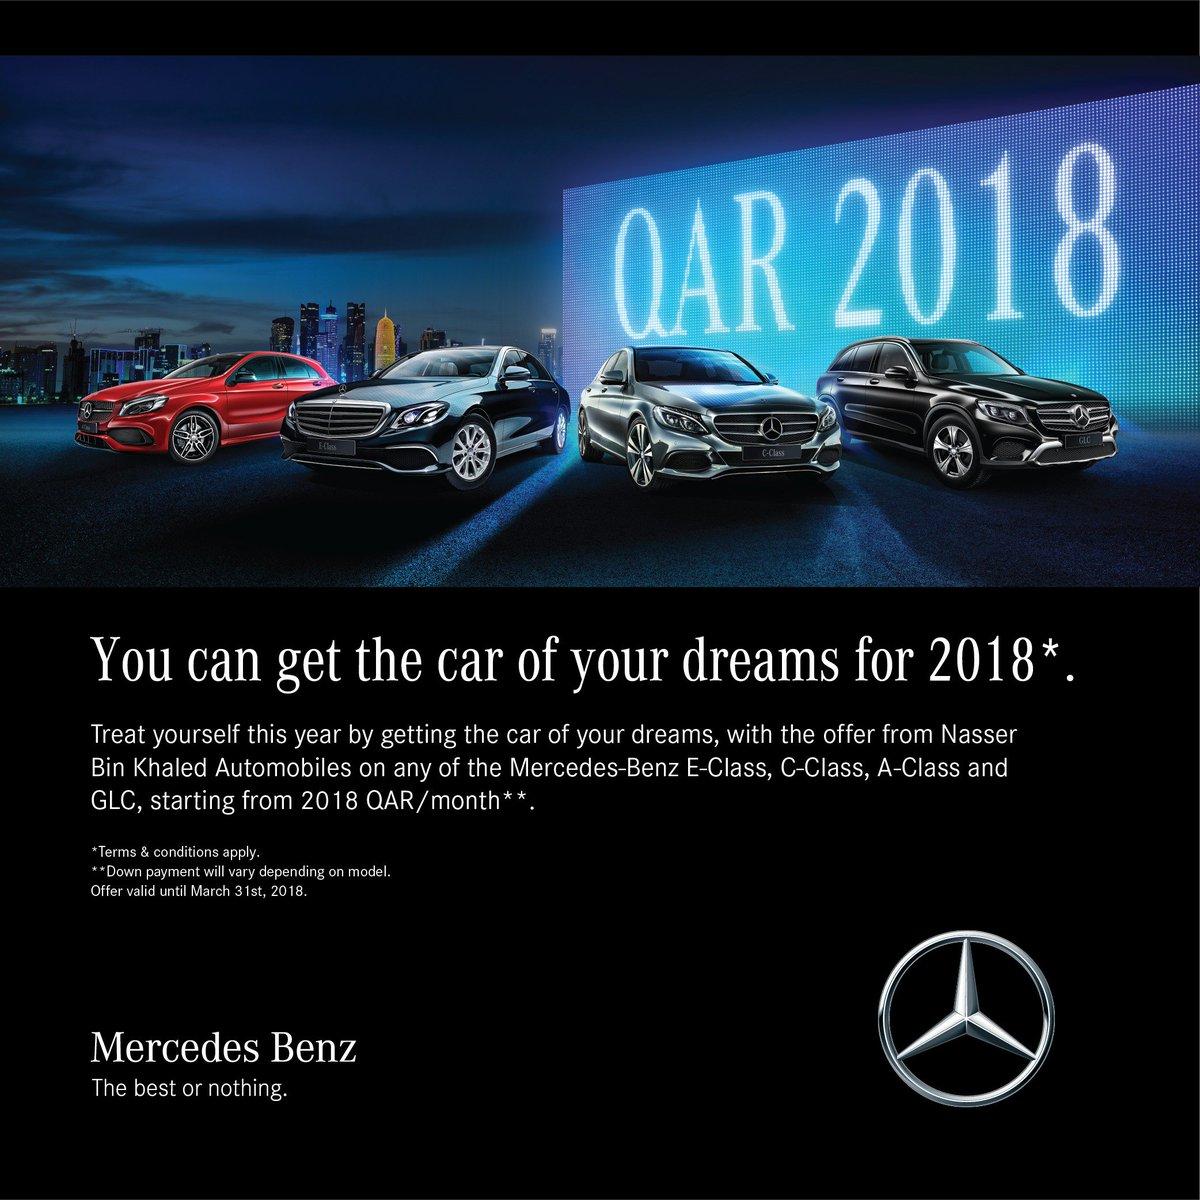 Mercedes benz qatar nbkmercedesbenz twitter for Mercedes benz qatar